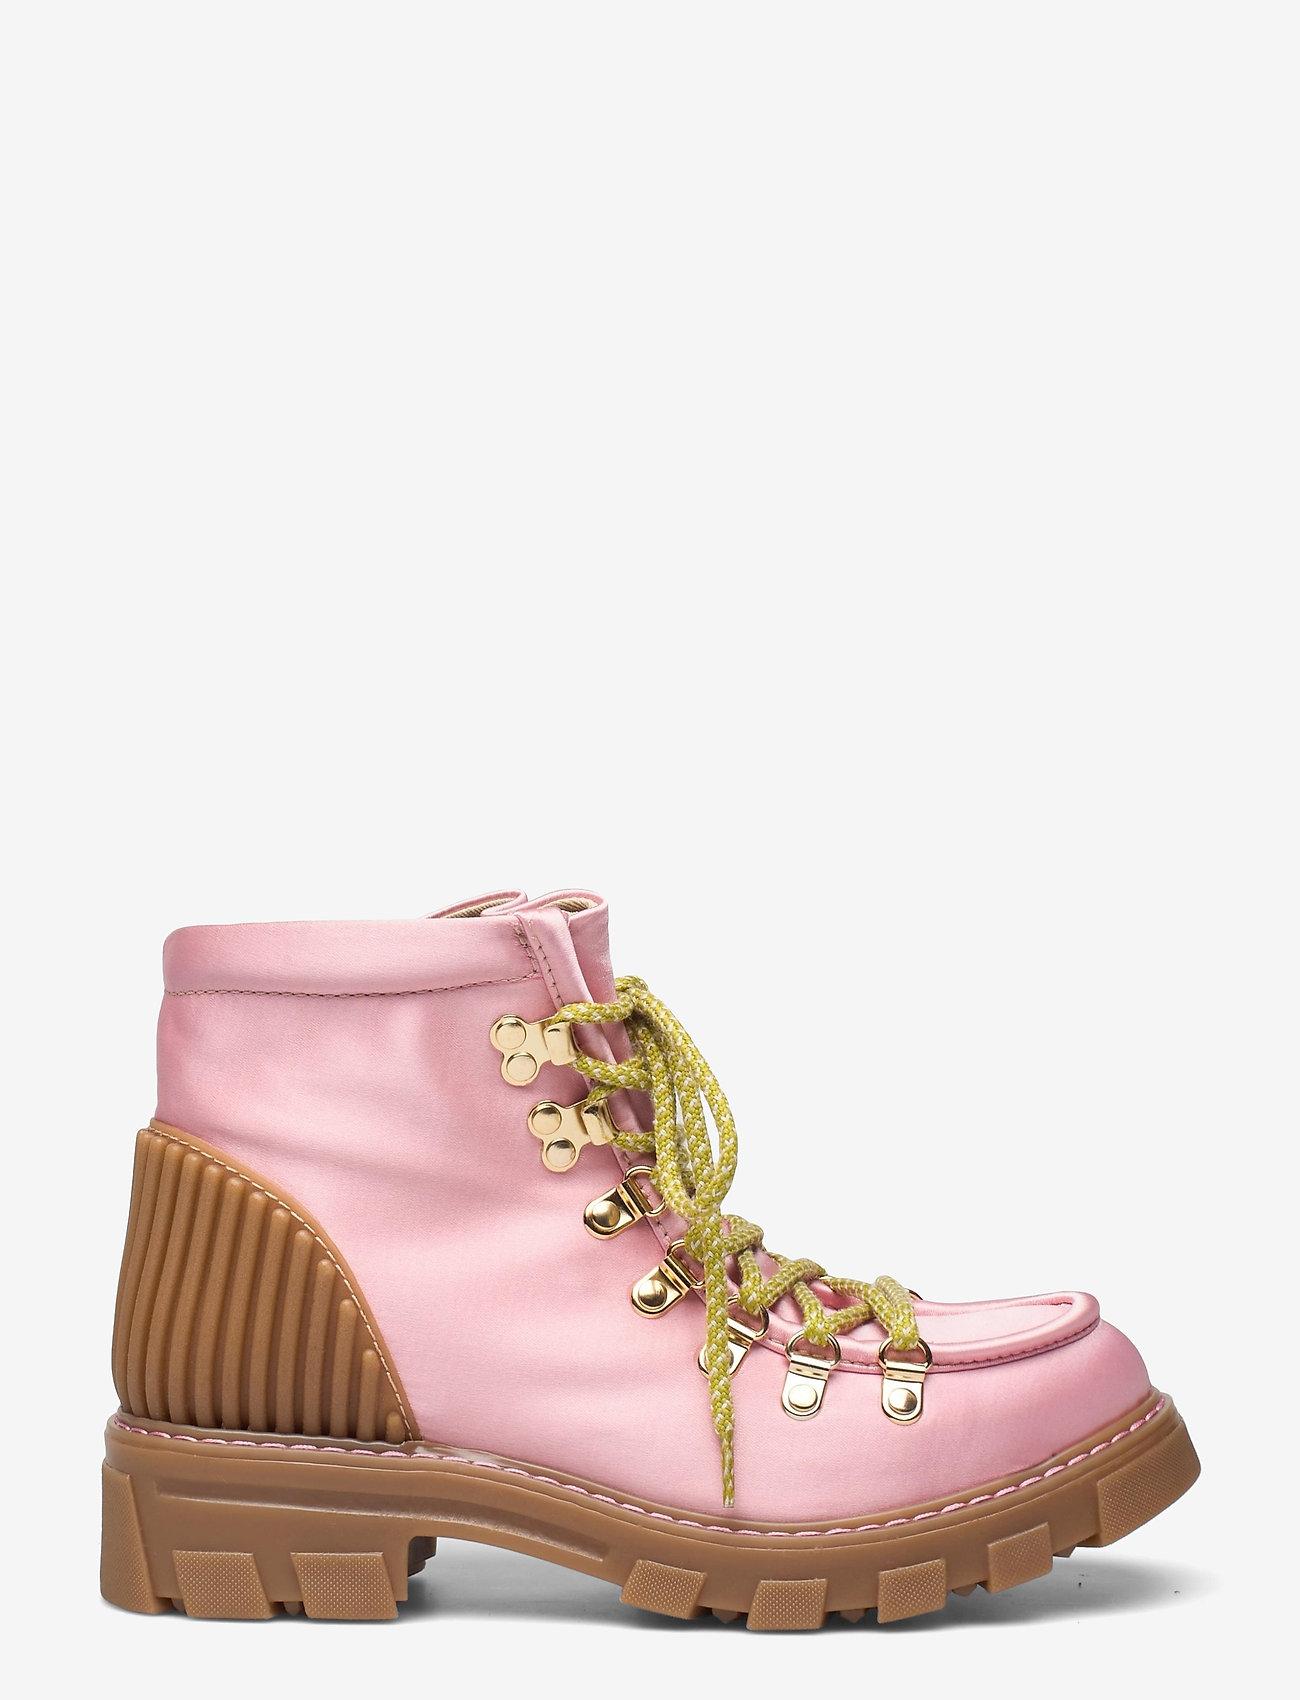 STINE GOYA - Vera, 1154 Satin Boots - flade ankelstøvler - pink - 1